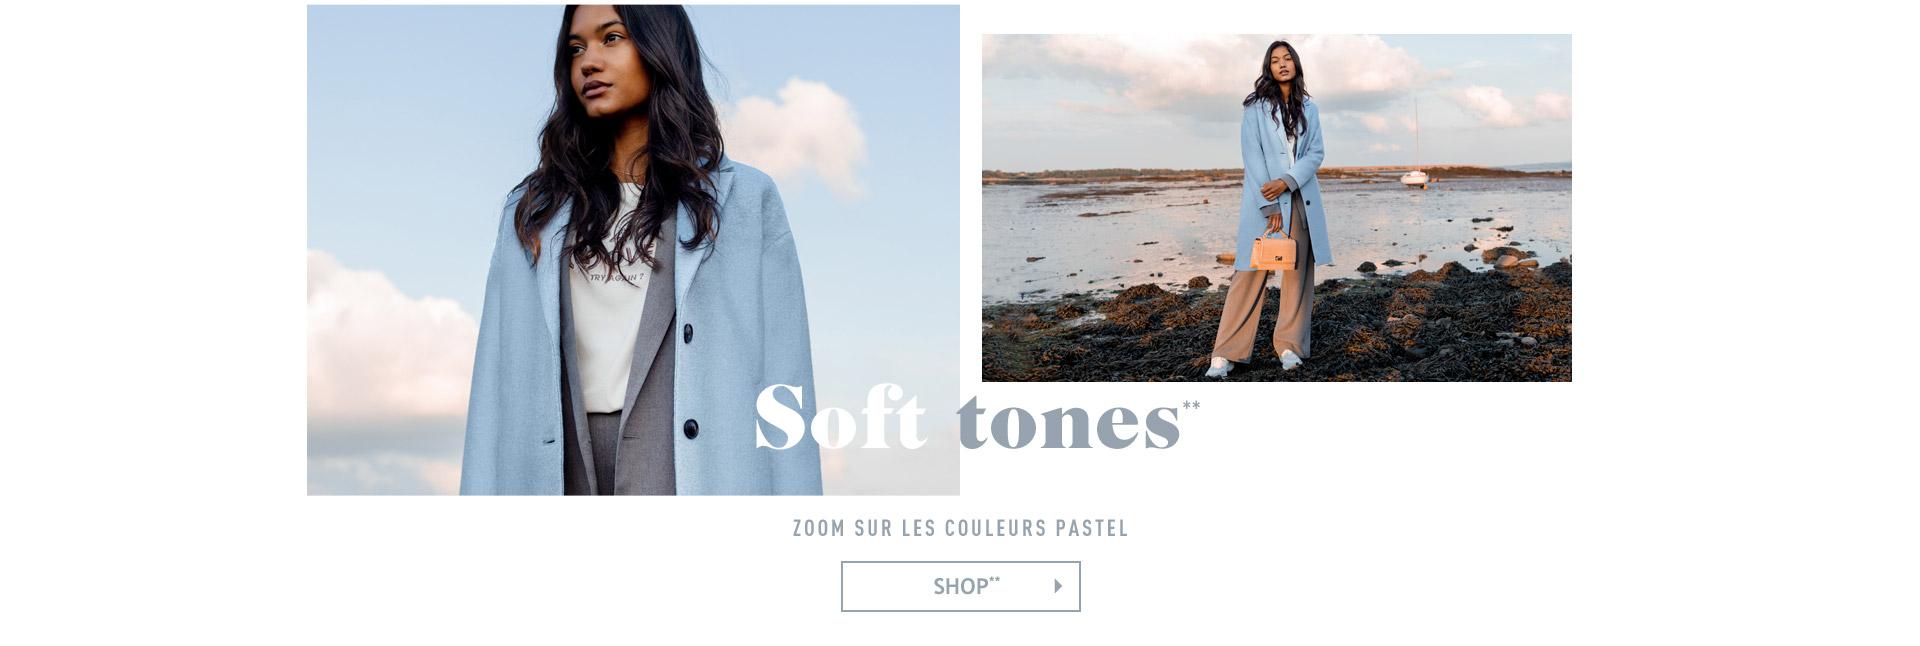 Soft tones**